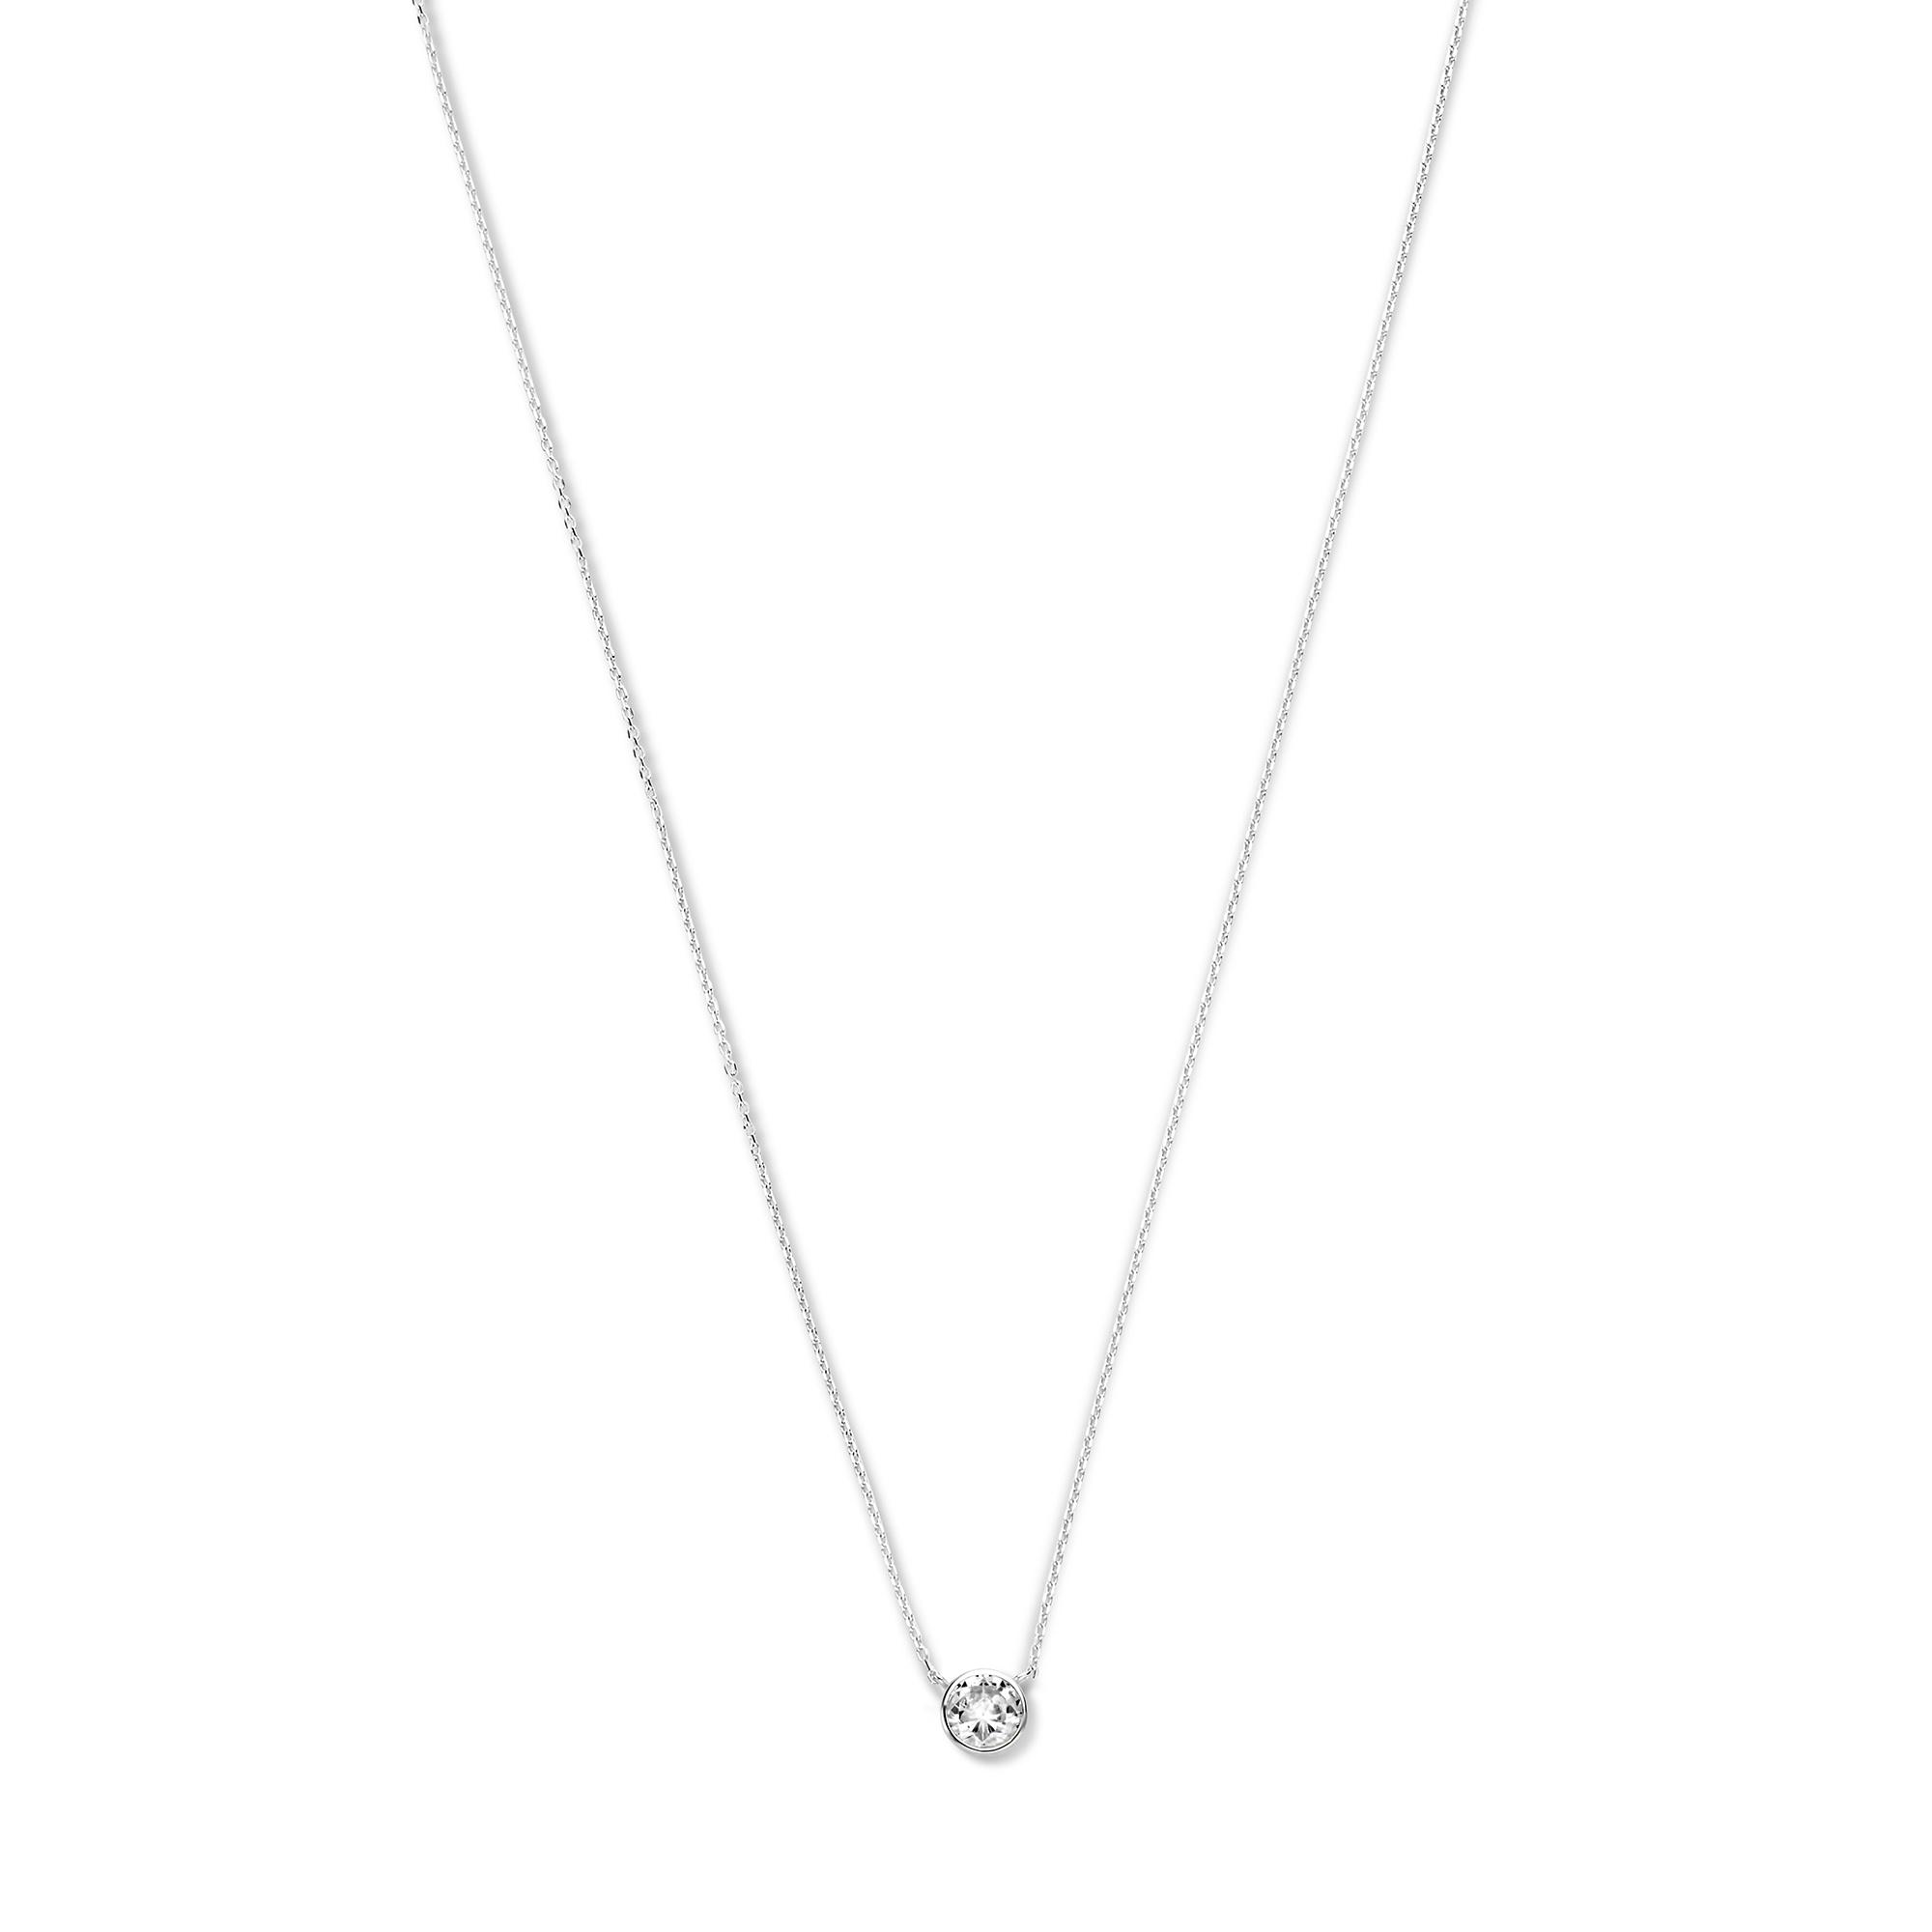 Violet Hamden Venus collana in argento sterling 925 con birthstone